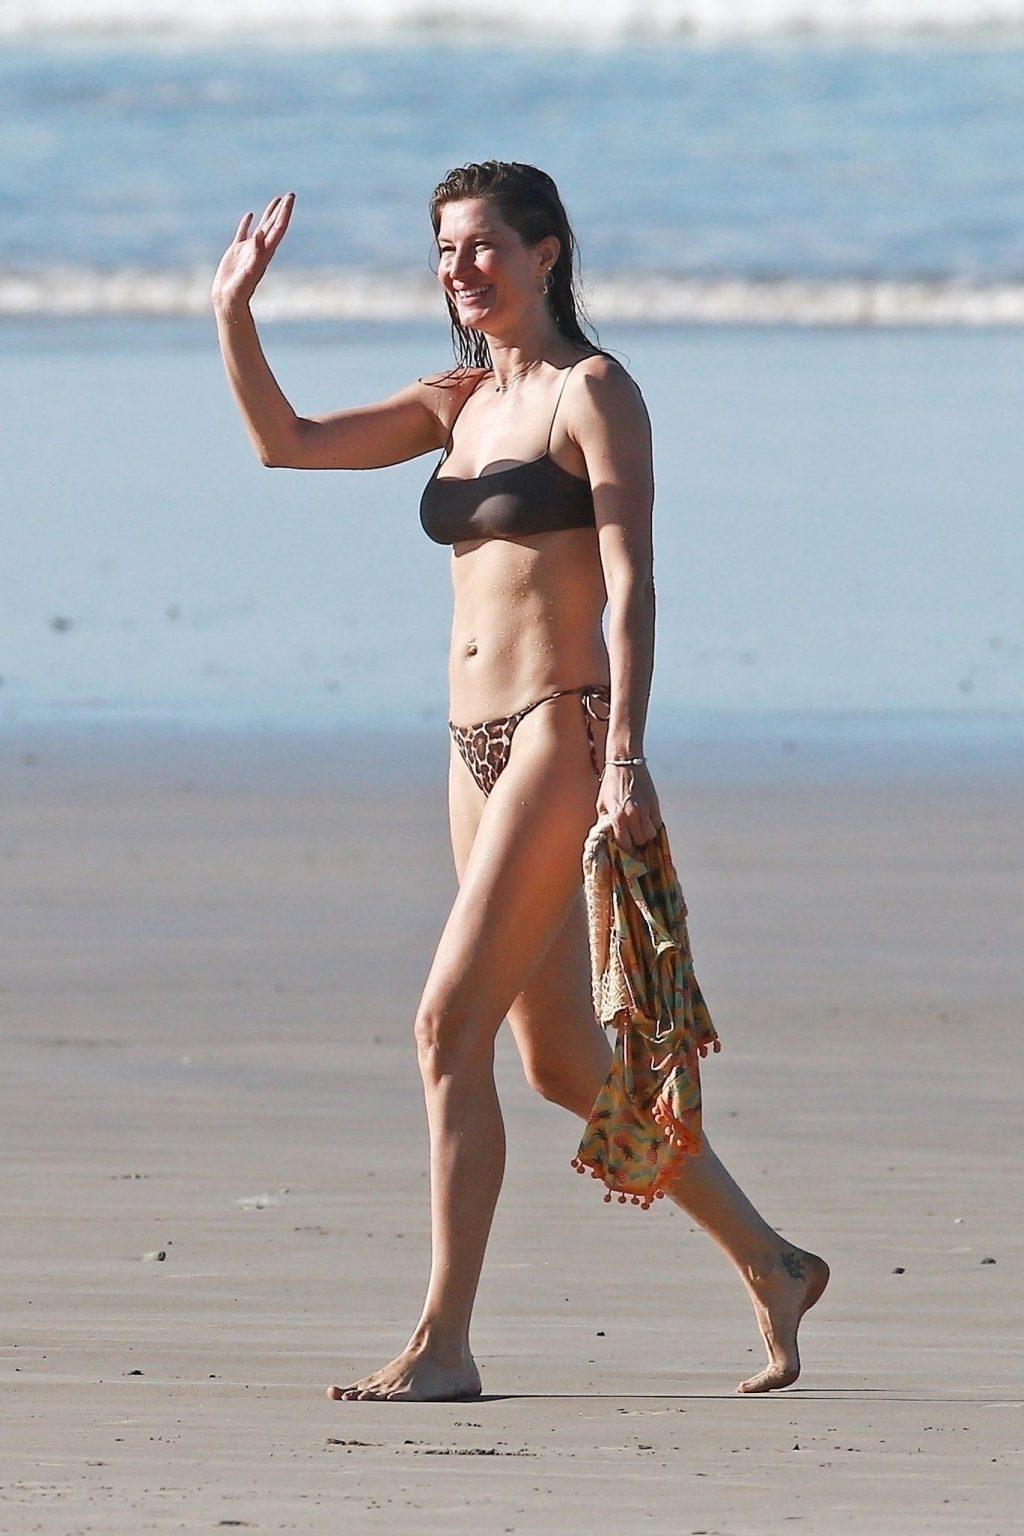 Gisele Bundchen Puts Her Incredible Bikini Body on Display During a Beach Photoshoot (35 Photos)